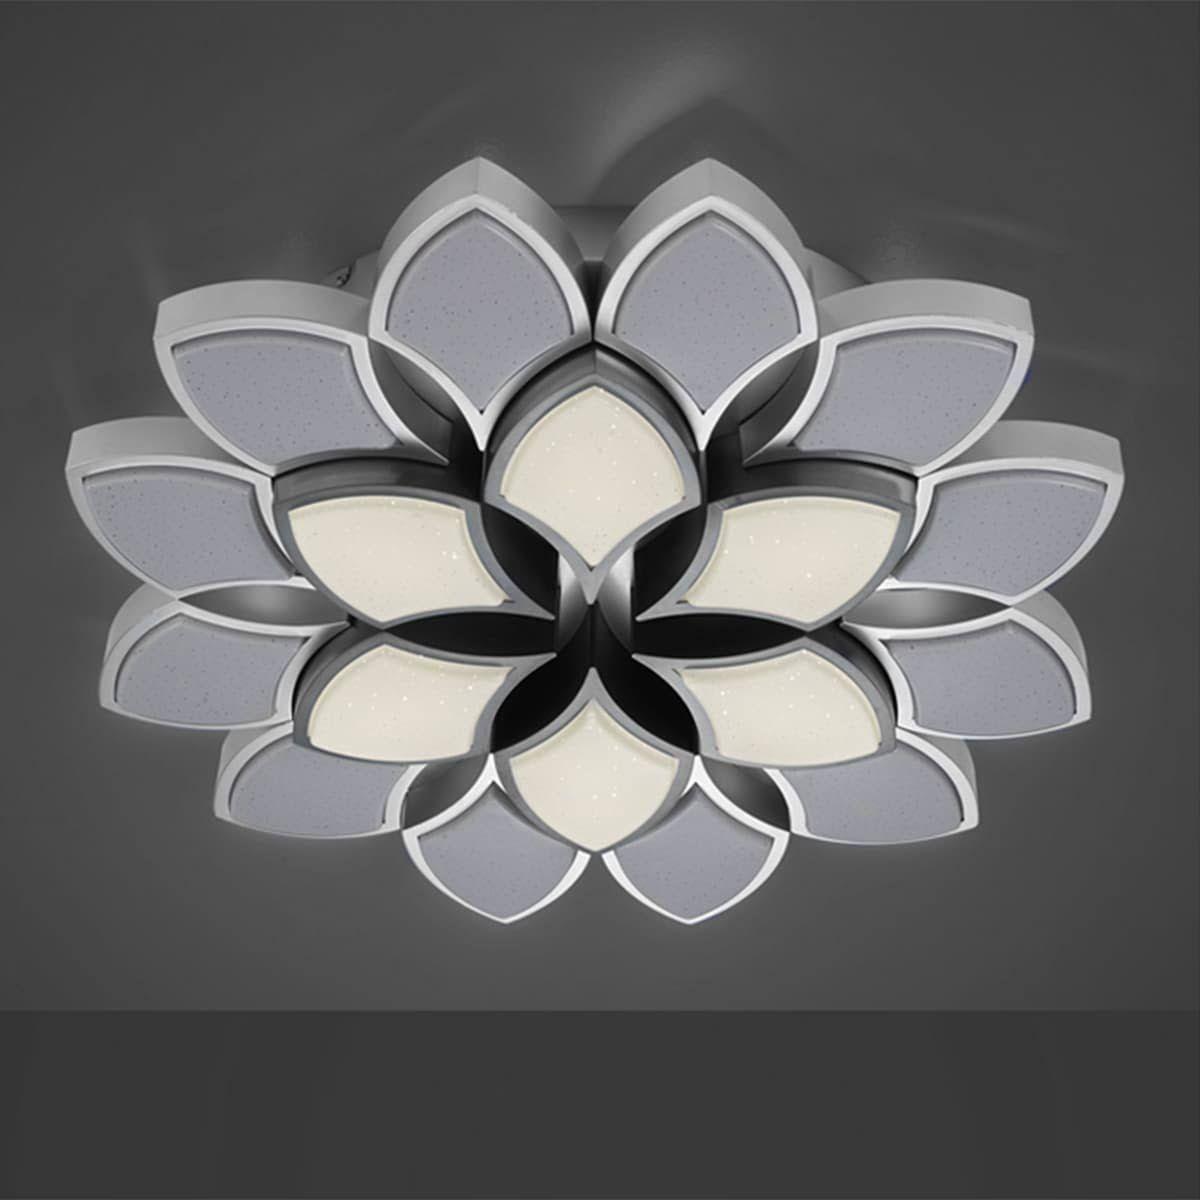 B-LeuchtenRose LED-Deckenleuchte70384/18-32